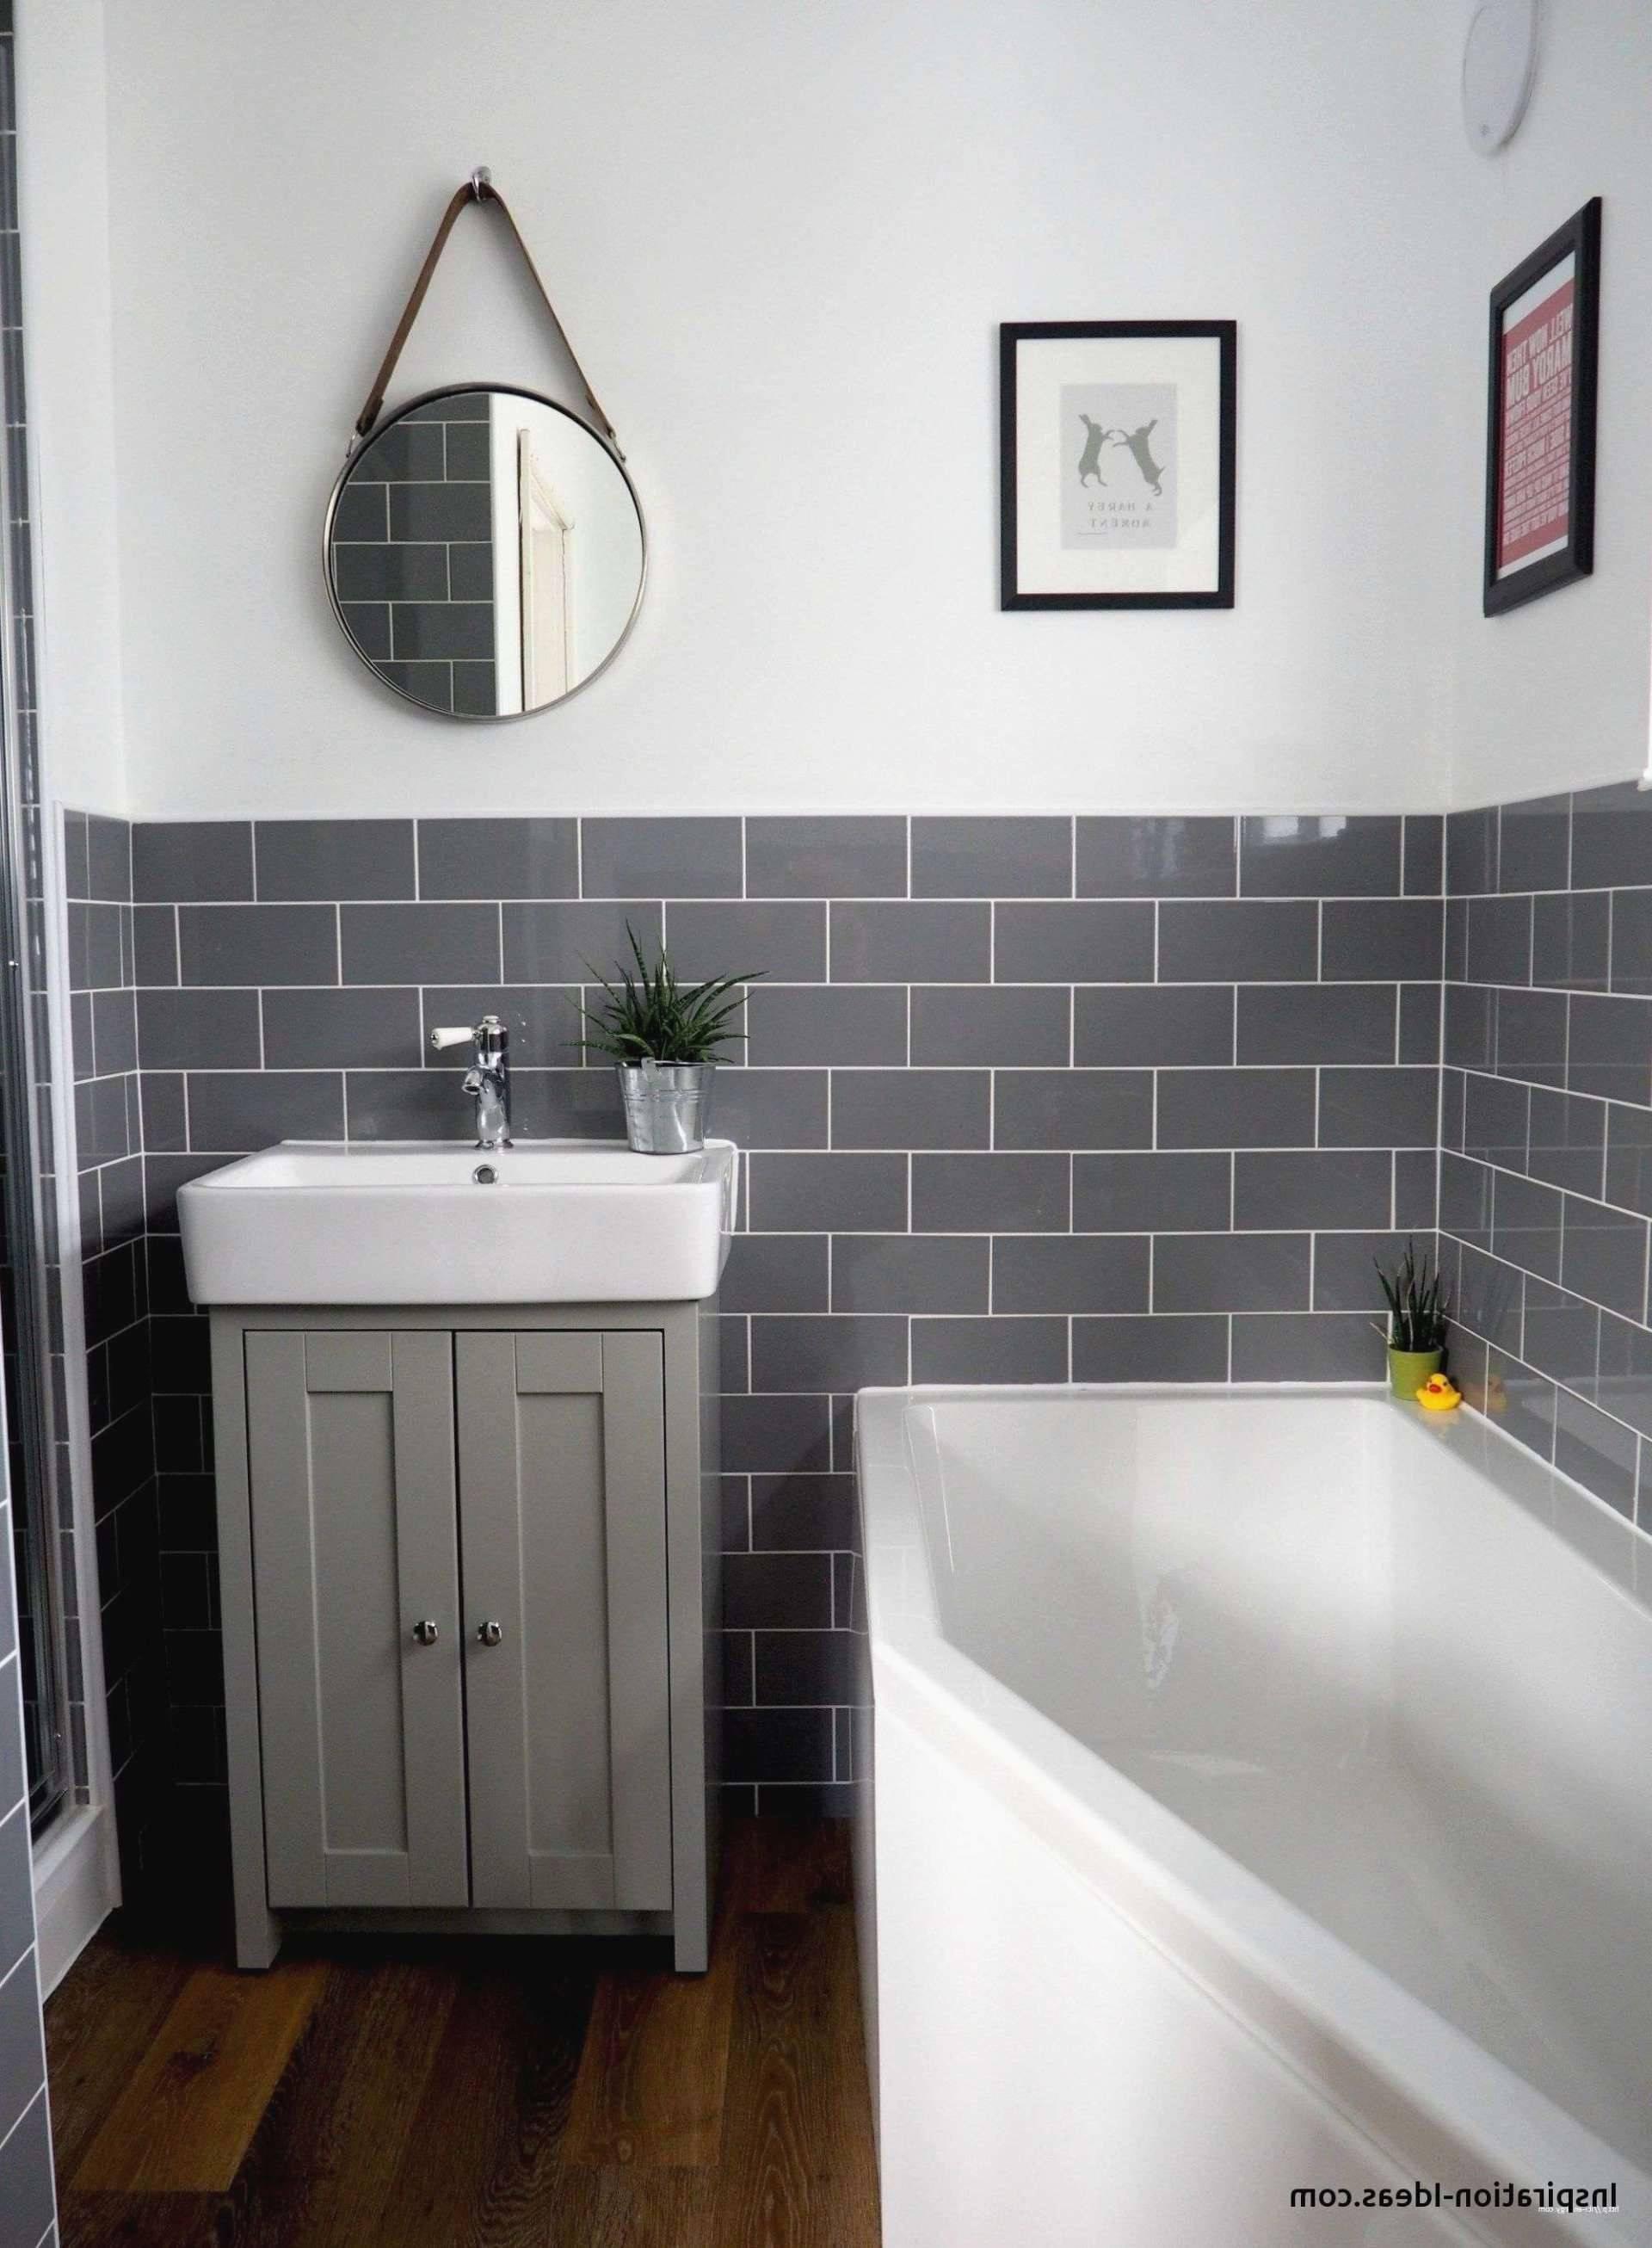 modern bathroom design ideas awesome small bathroom 5 x 5 maxwebshop of modern bathroom design ideas